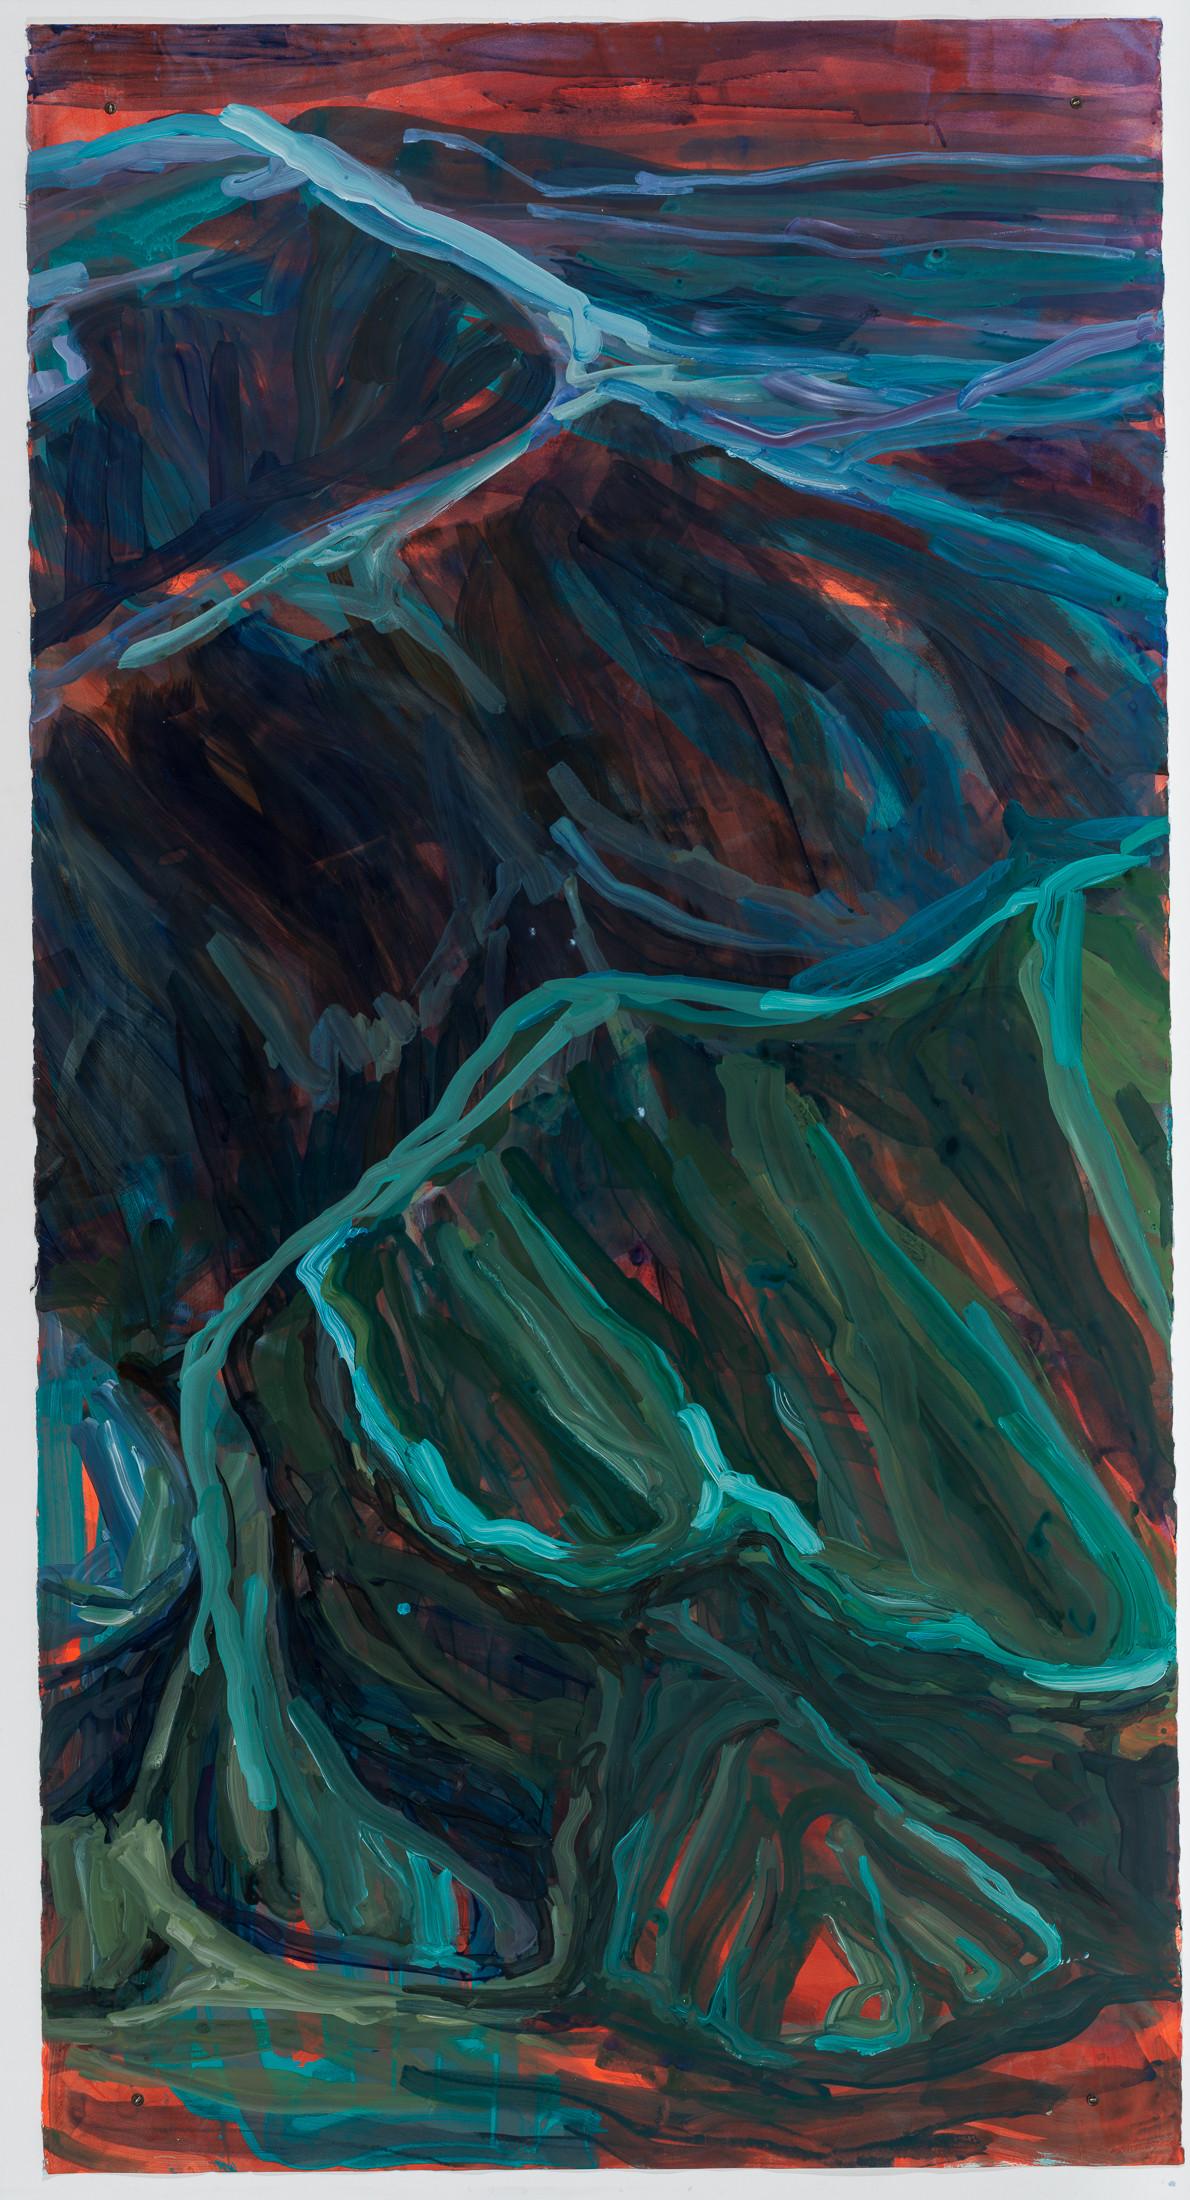 Liquid Sand, acrylic on watercolor paper, 250 x 130 cm DMF 2020